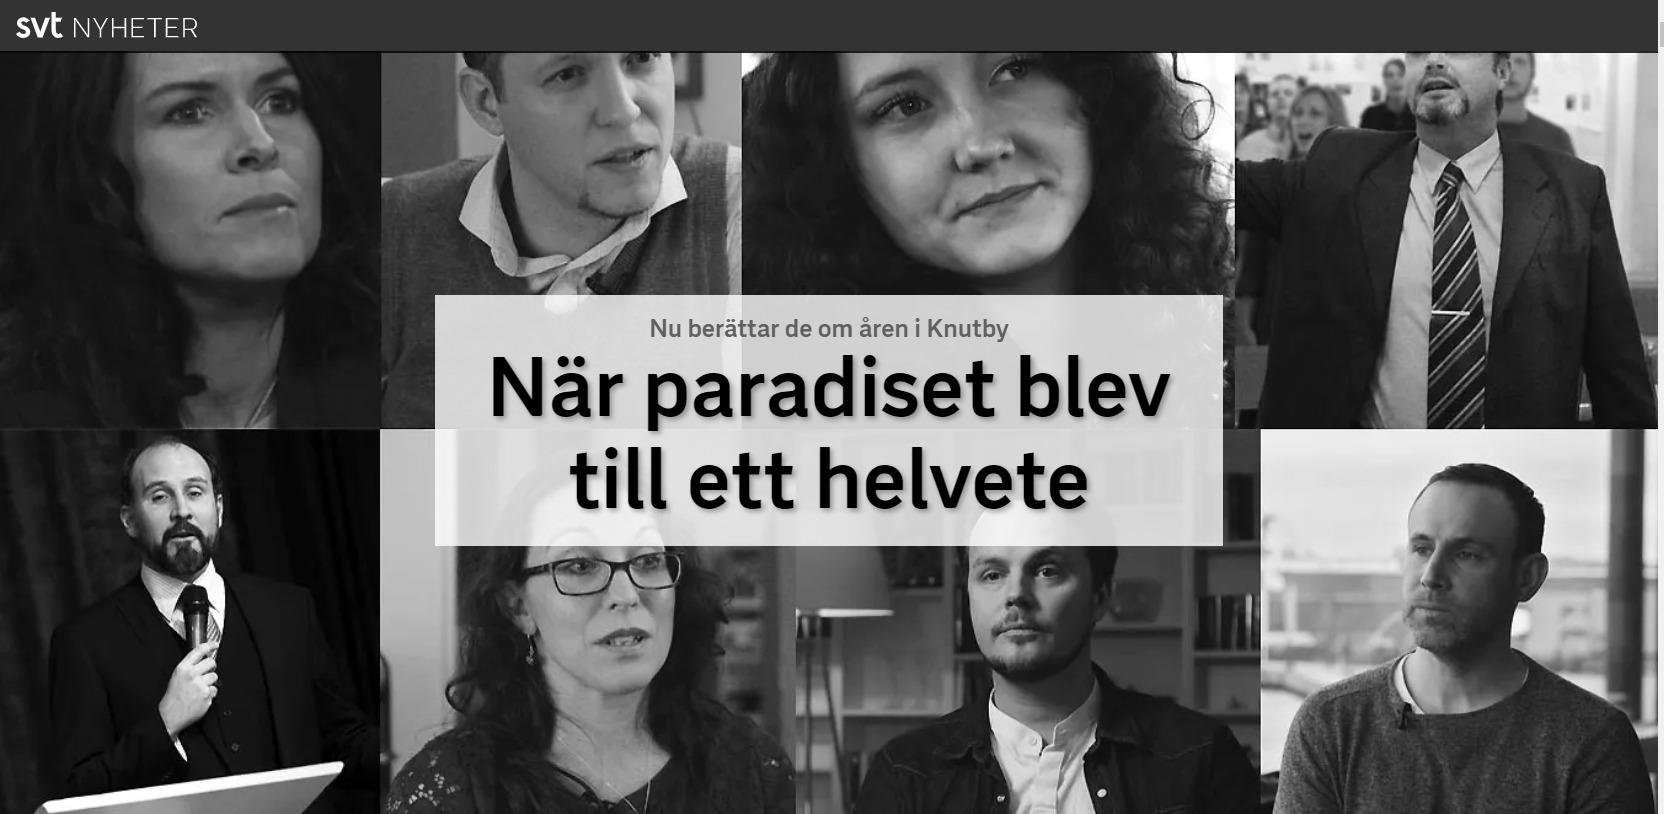 Knutby Paradiset som blev till ett helvete - SVT Nyheter